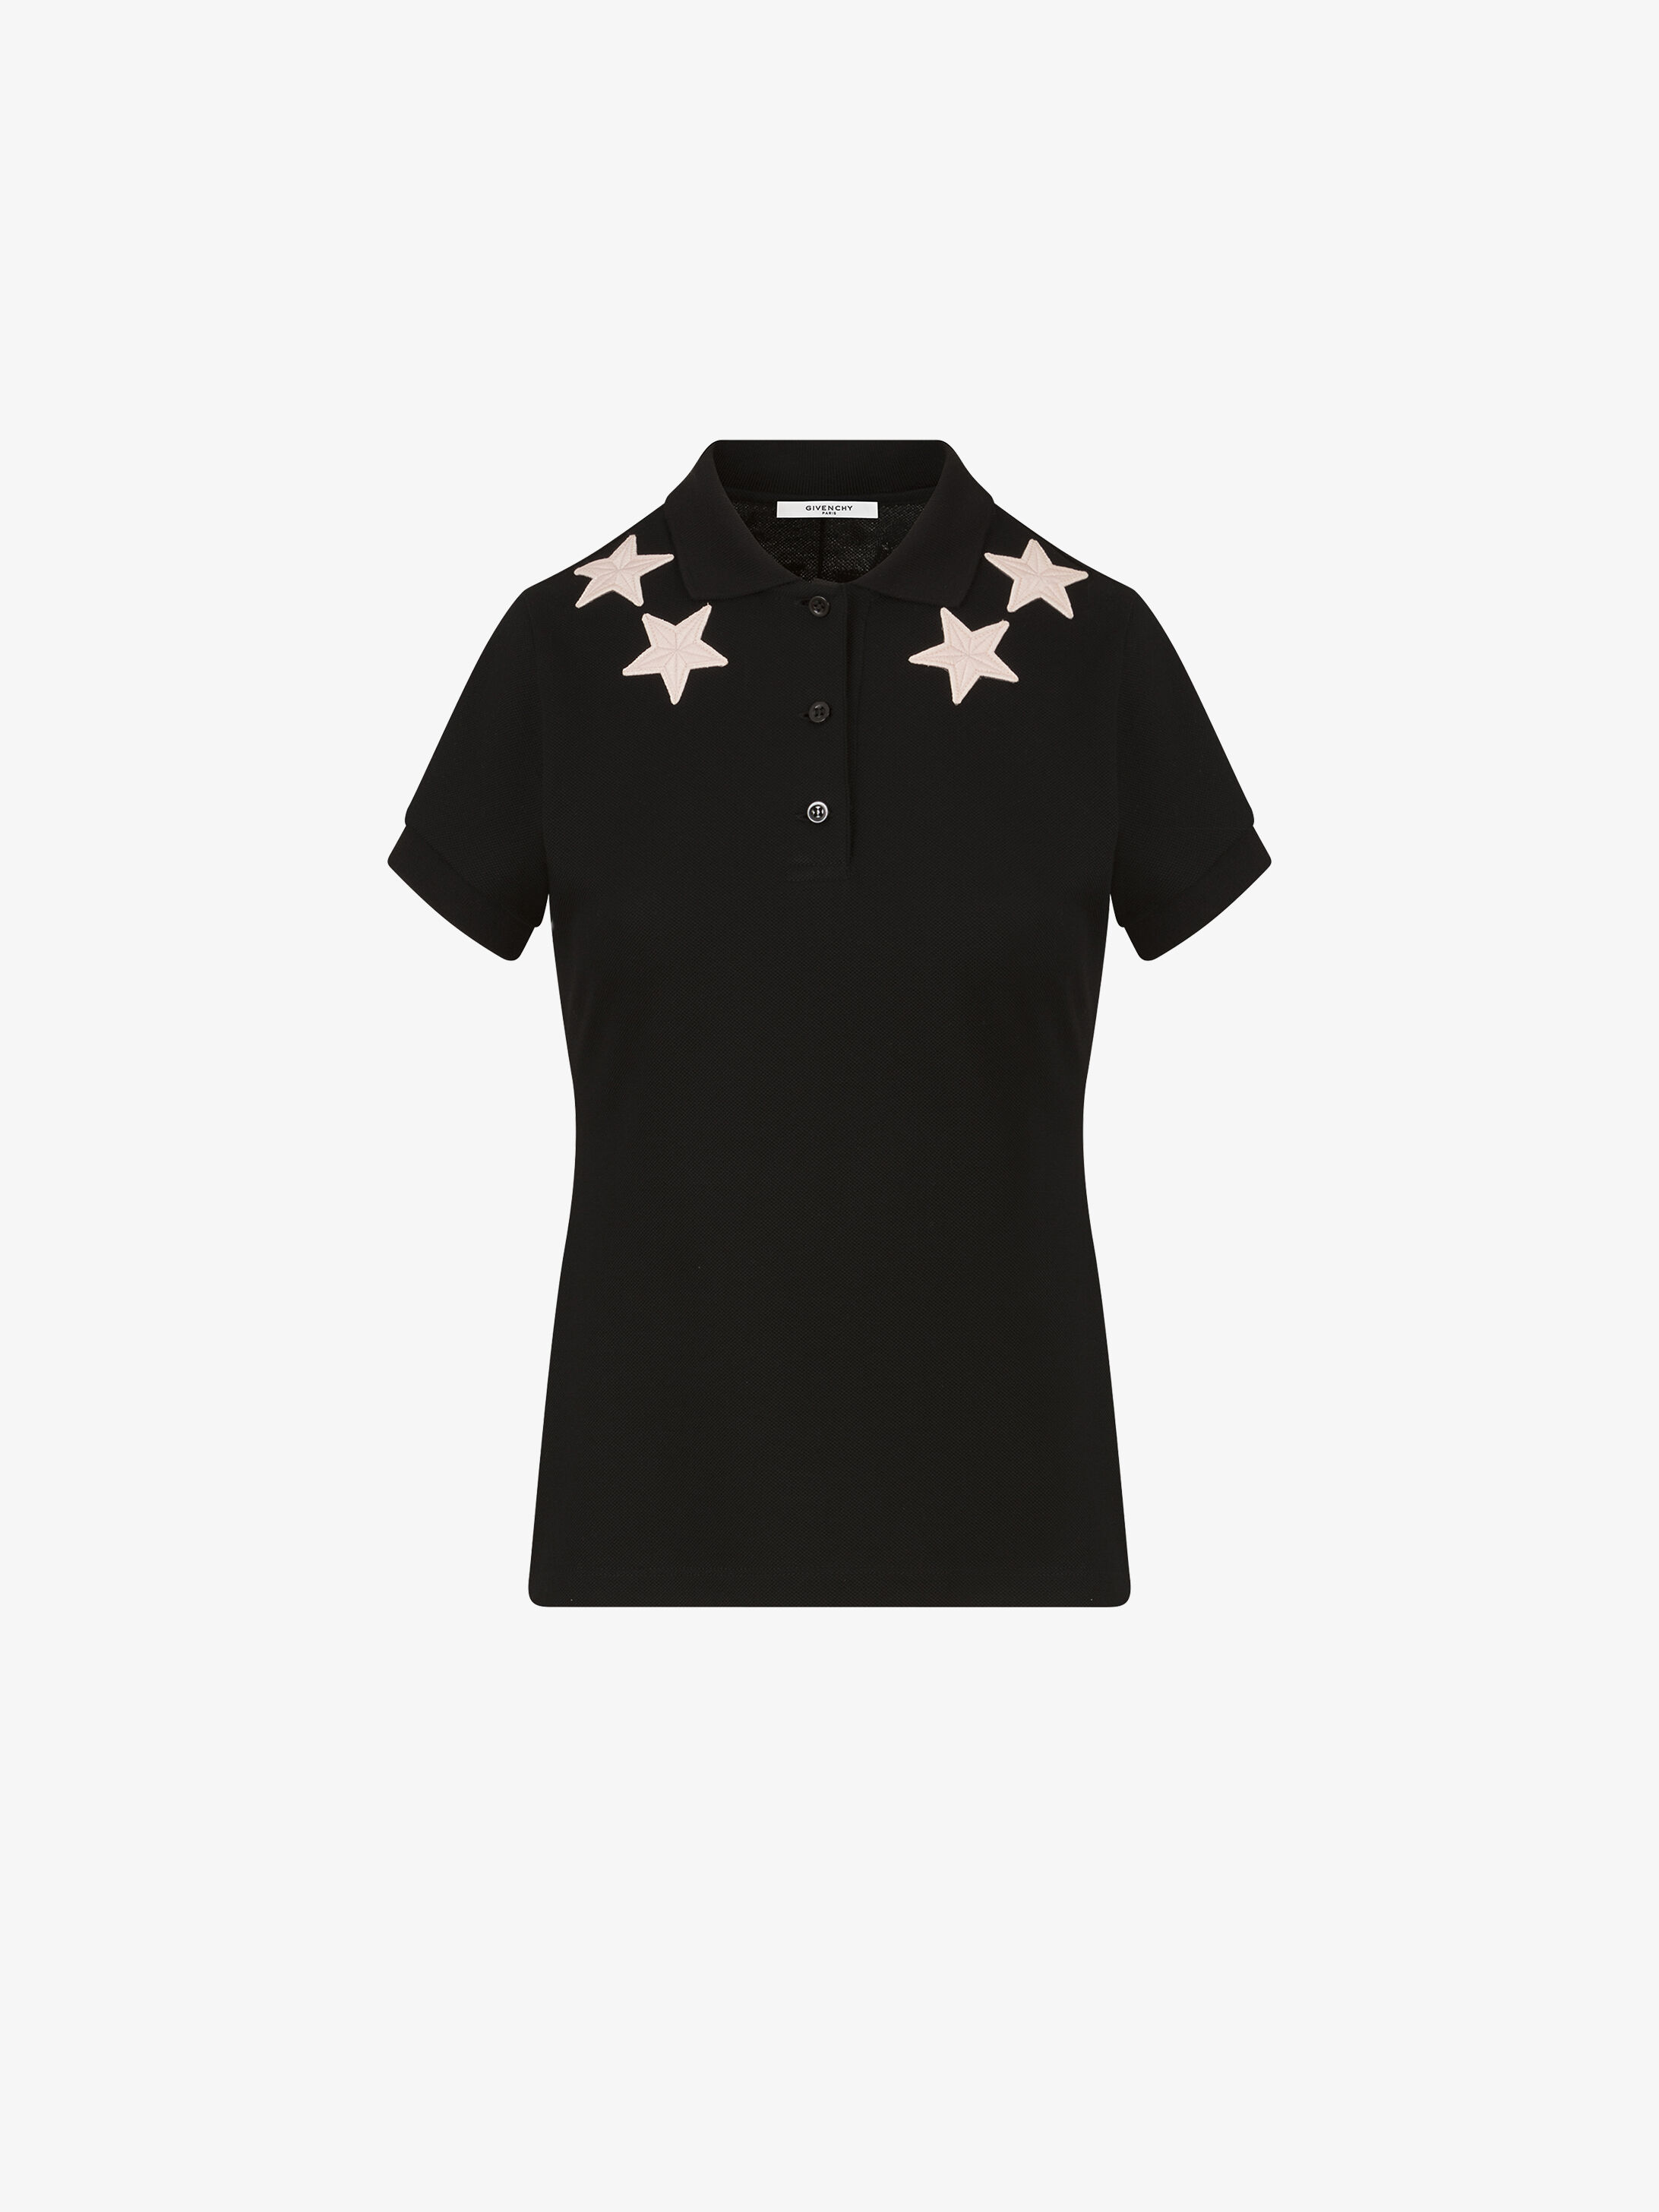 cbef3f8c Givenchy Stars emrboidered polo shirt | GIVENCHY Paris